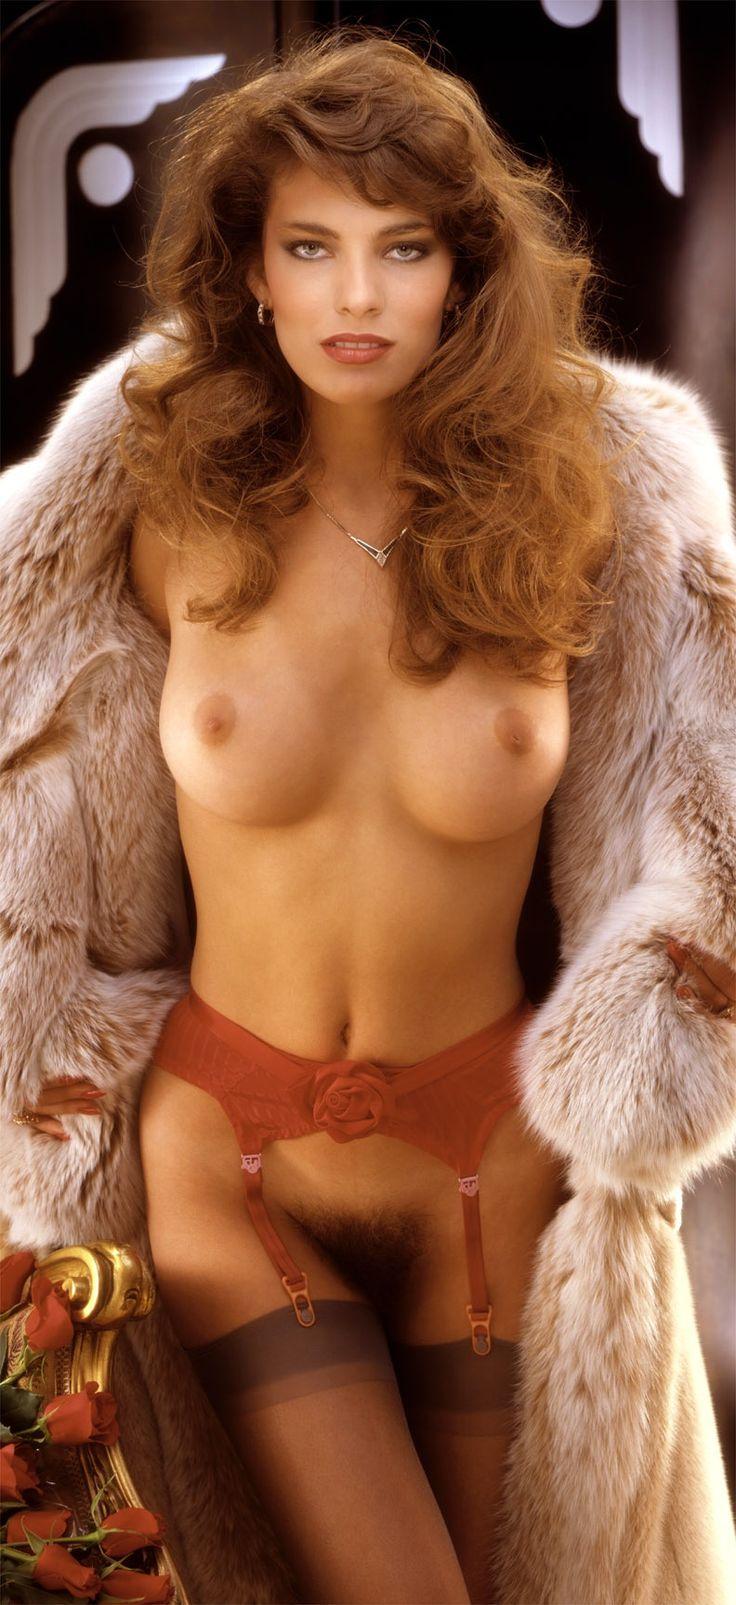 122 best playboy centerfold 1980-1989 images on pinterest | playboy